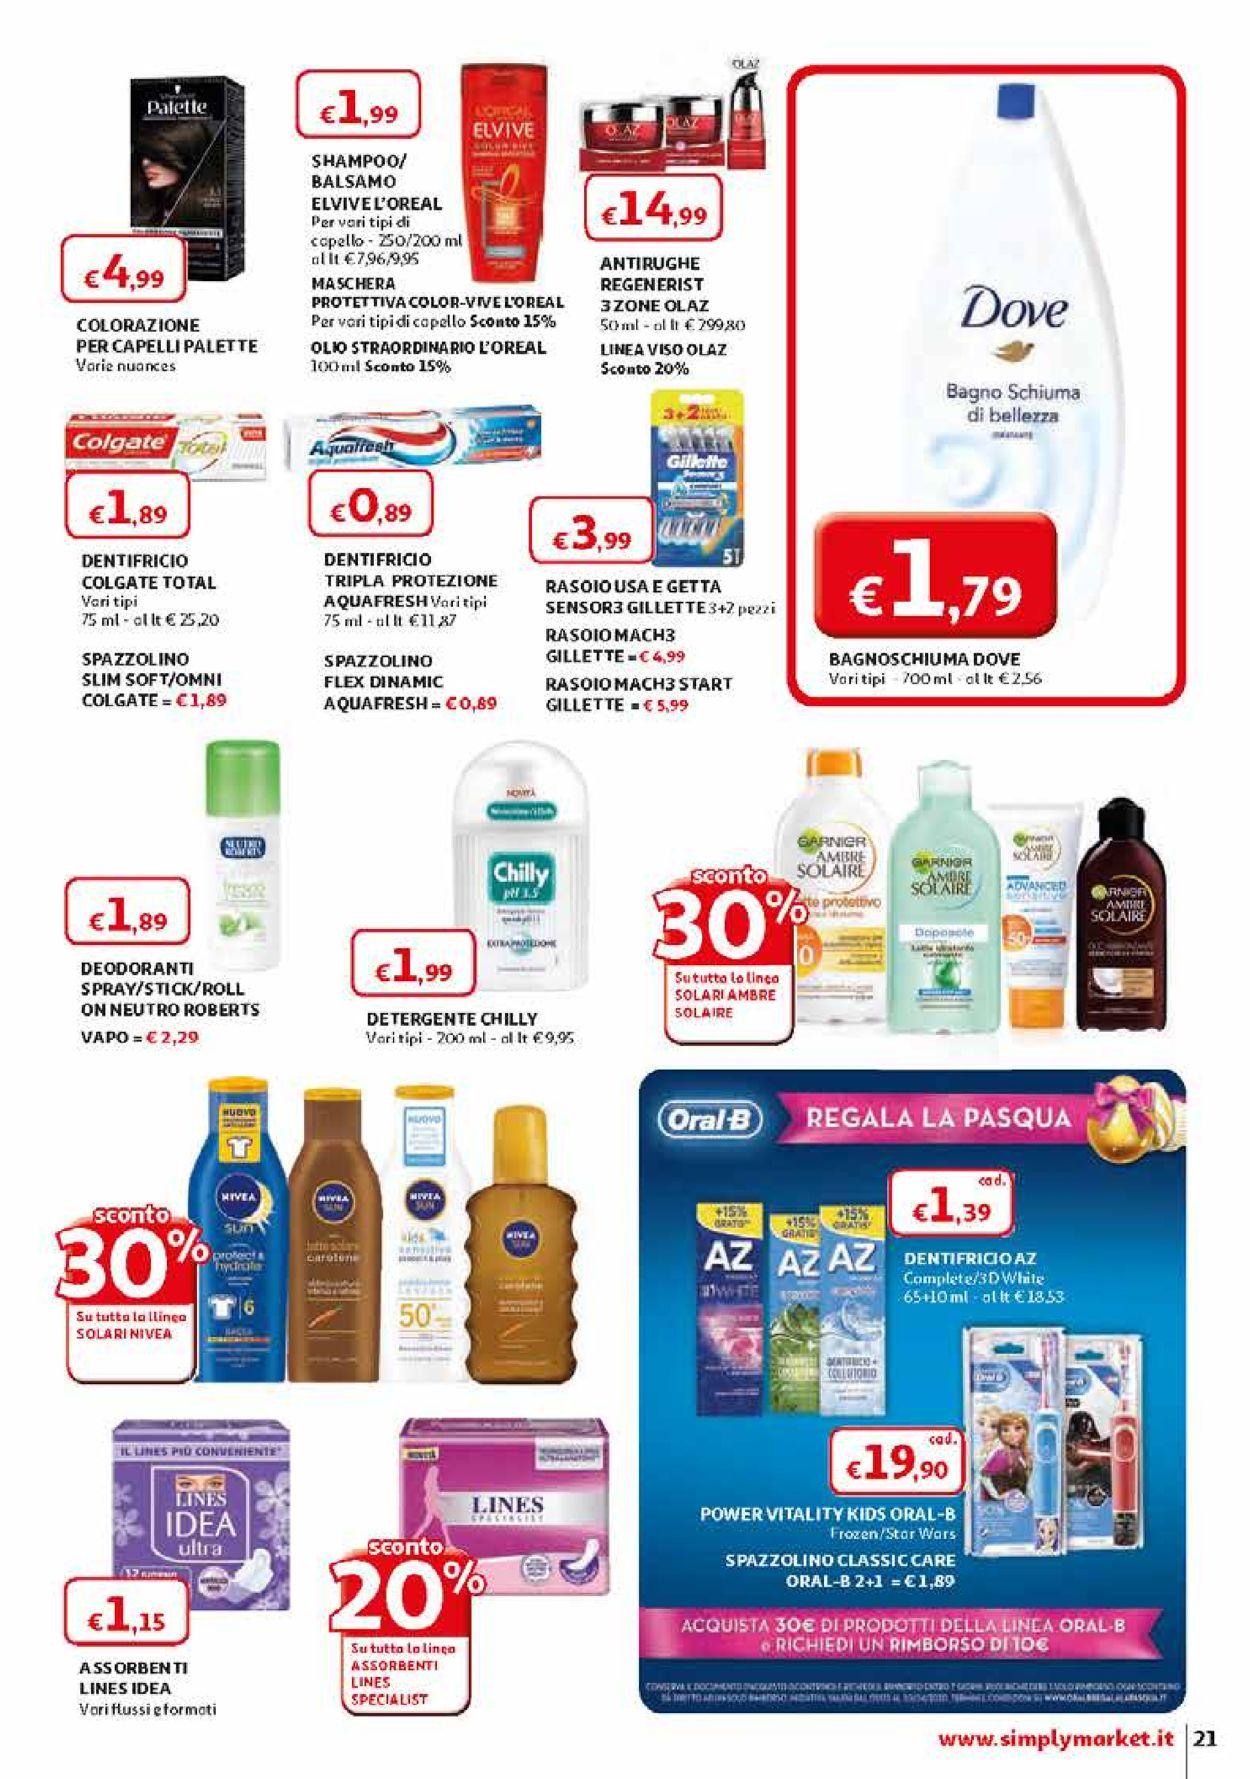 Volantino Simply Market - Offerte 28/03-11/04/2020 (Pagina 21)